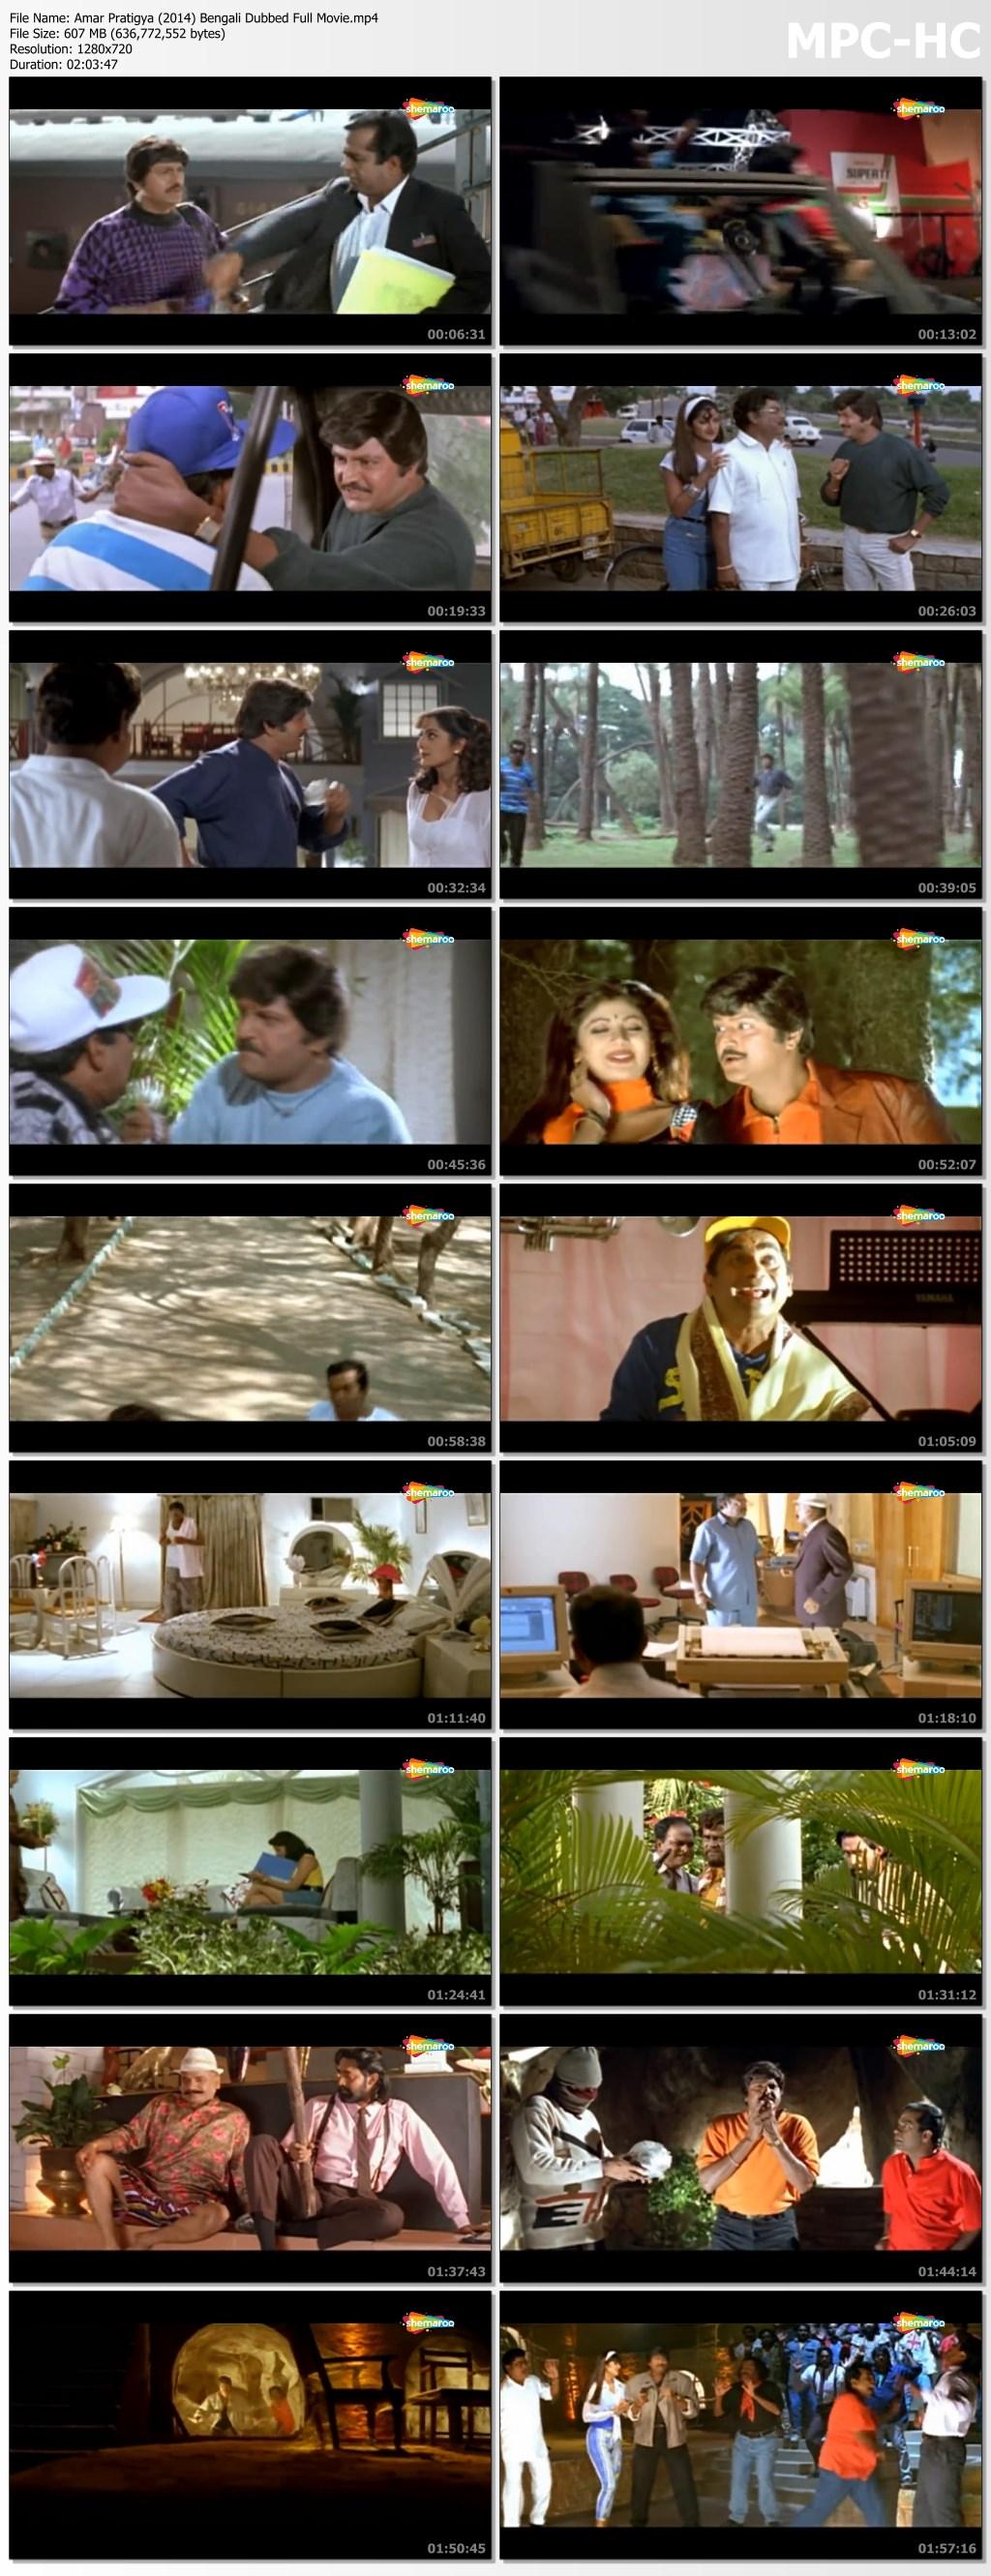 Amar Pratigya (2014) Bengali Dubbed Full Movie.mp4 thumbs